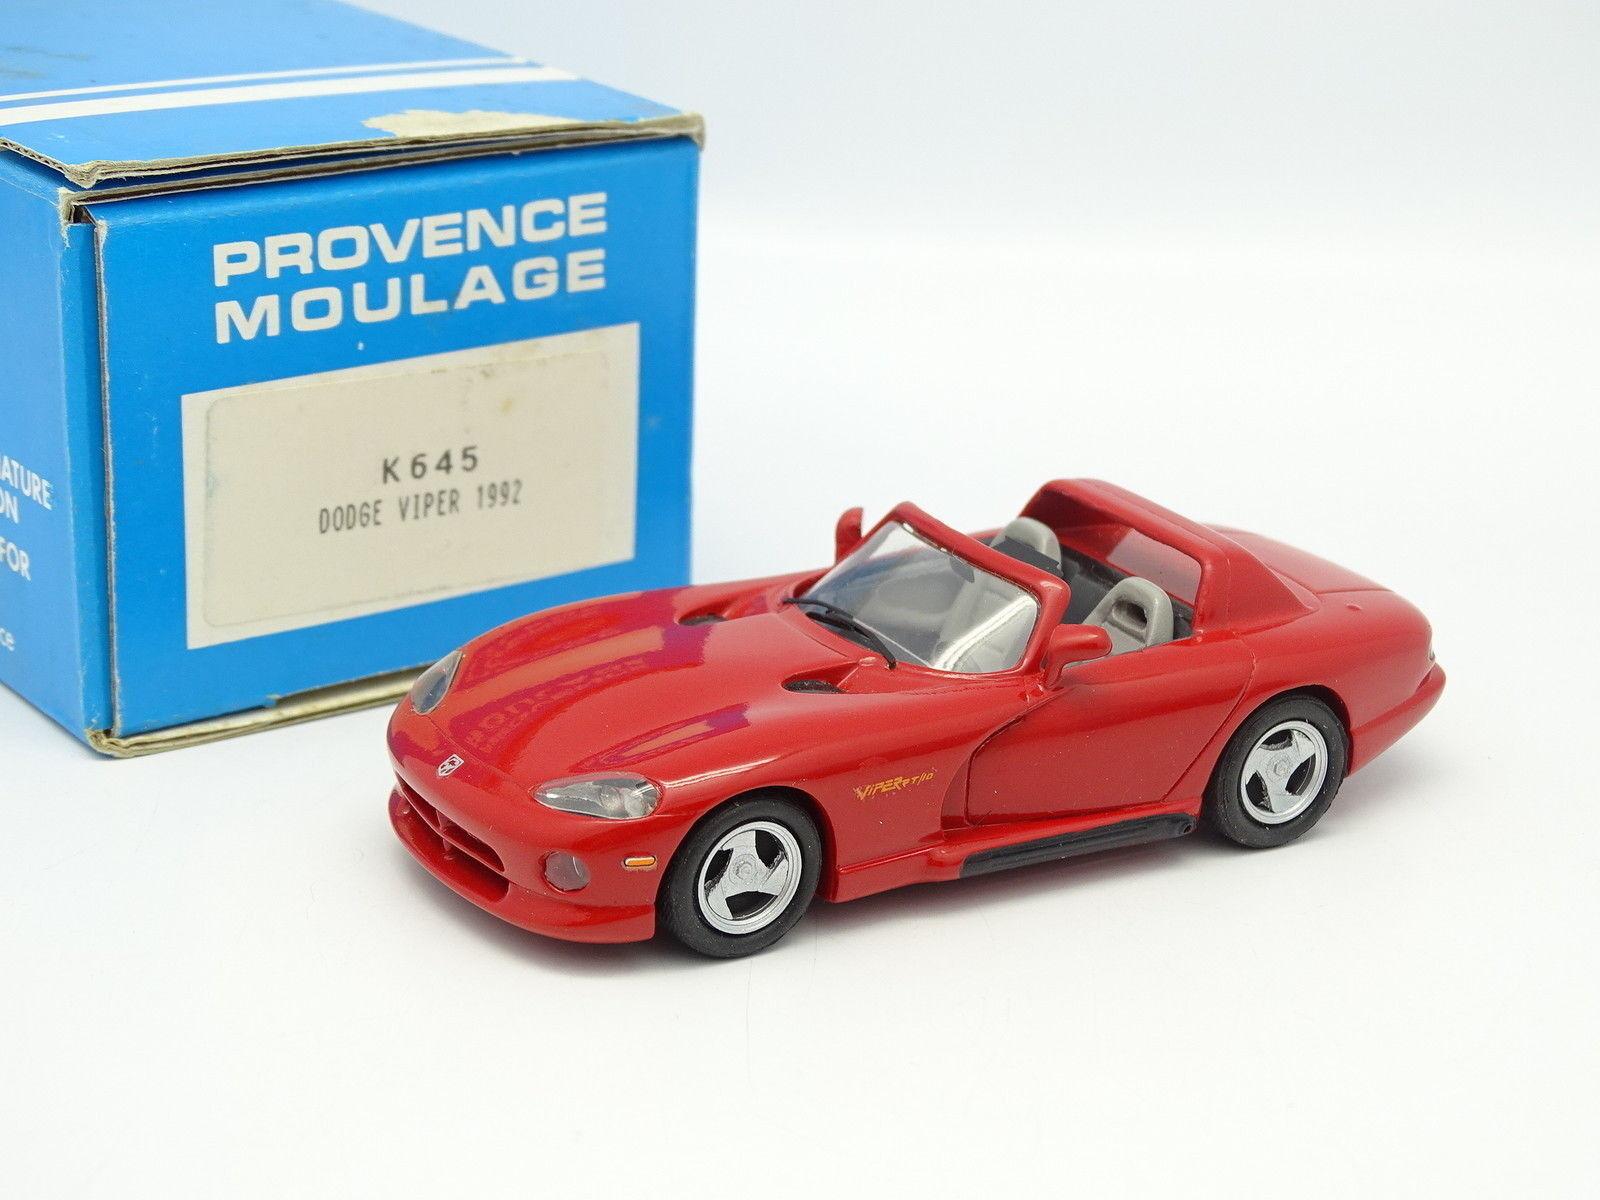 Provence Moulage Kit Monté 1 43 - Dodge Viper RT 10 1992 red